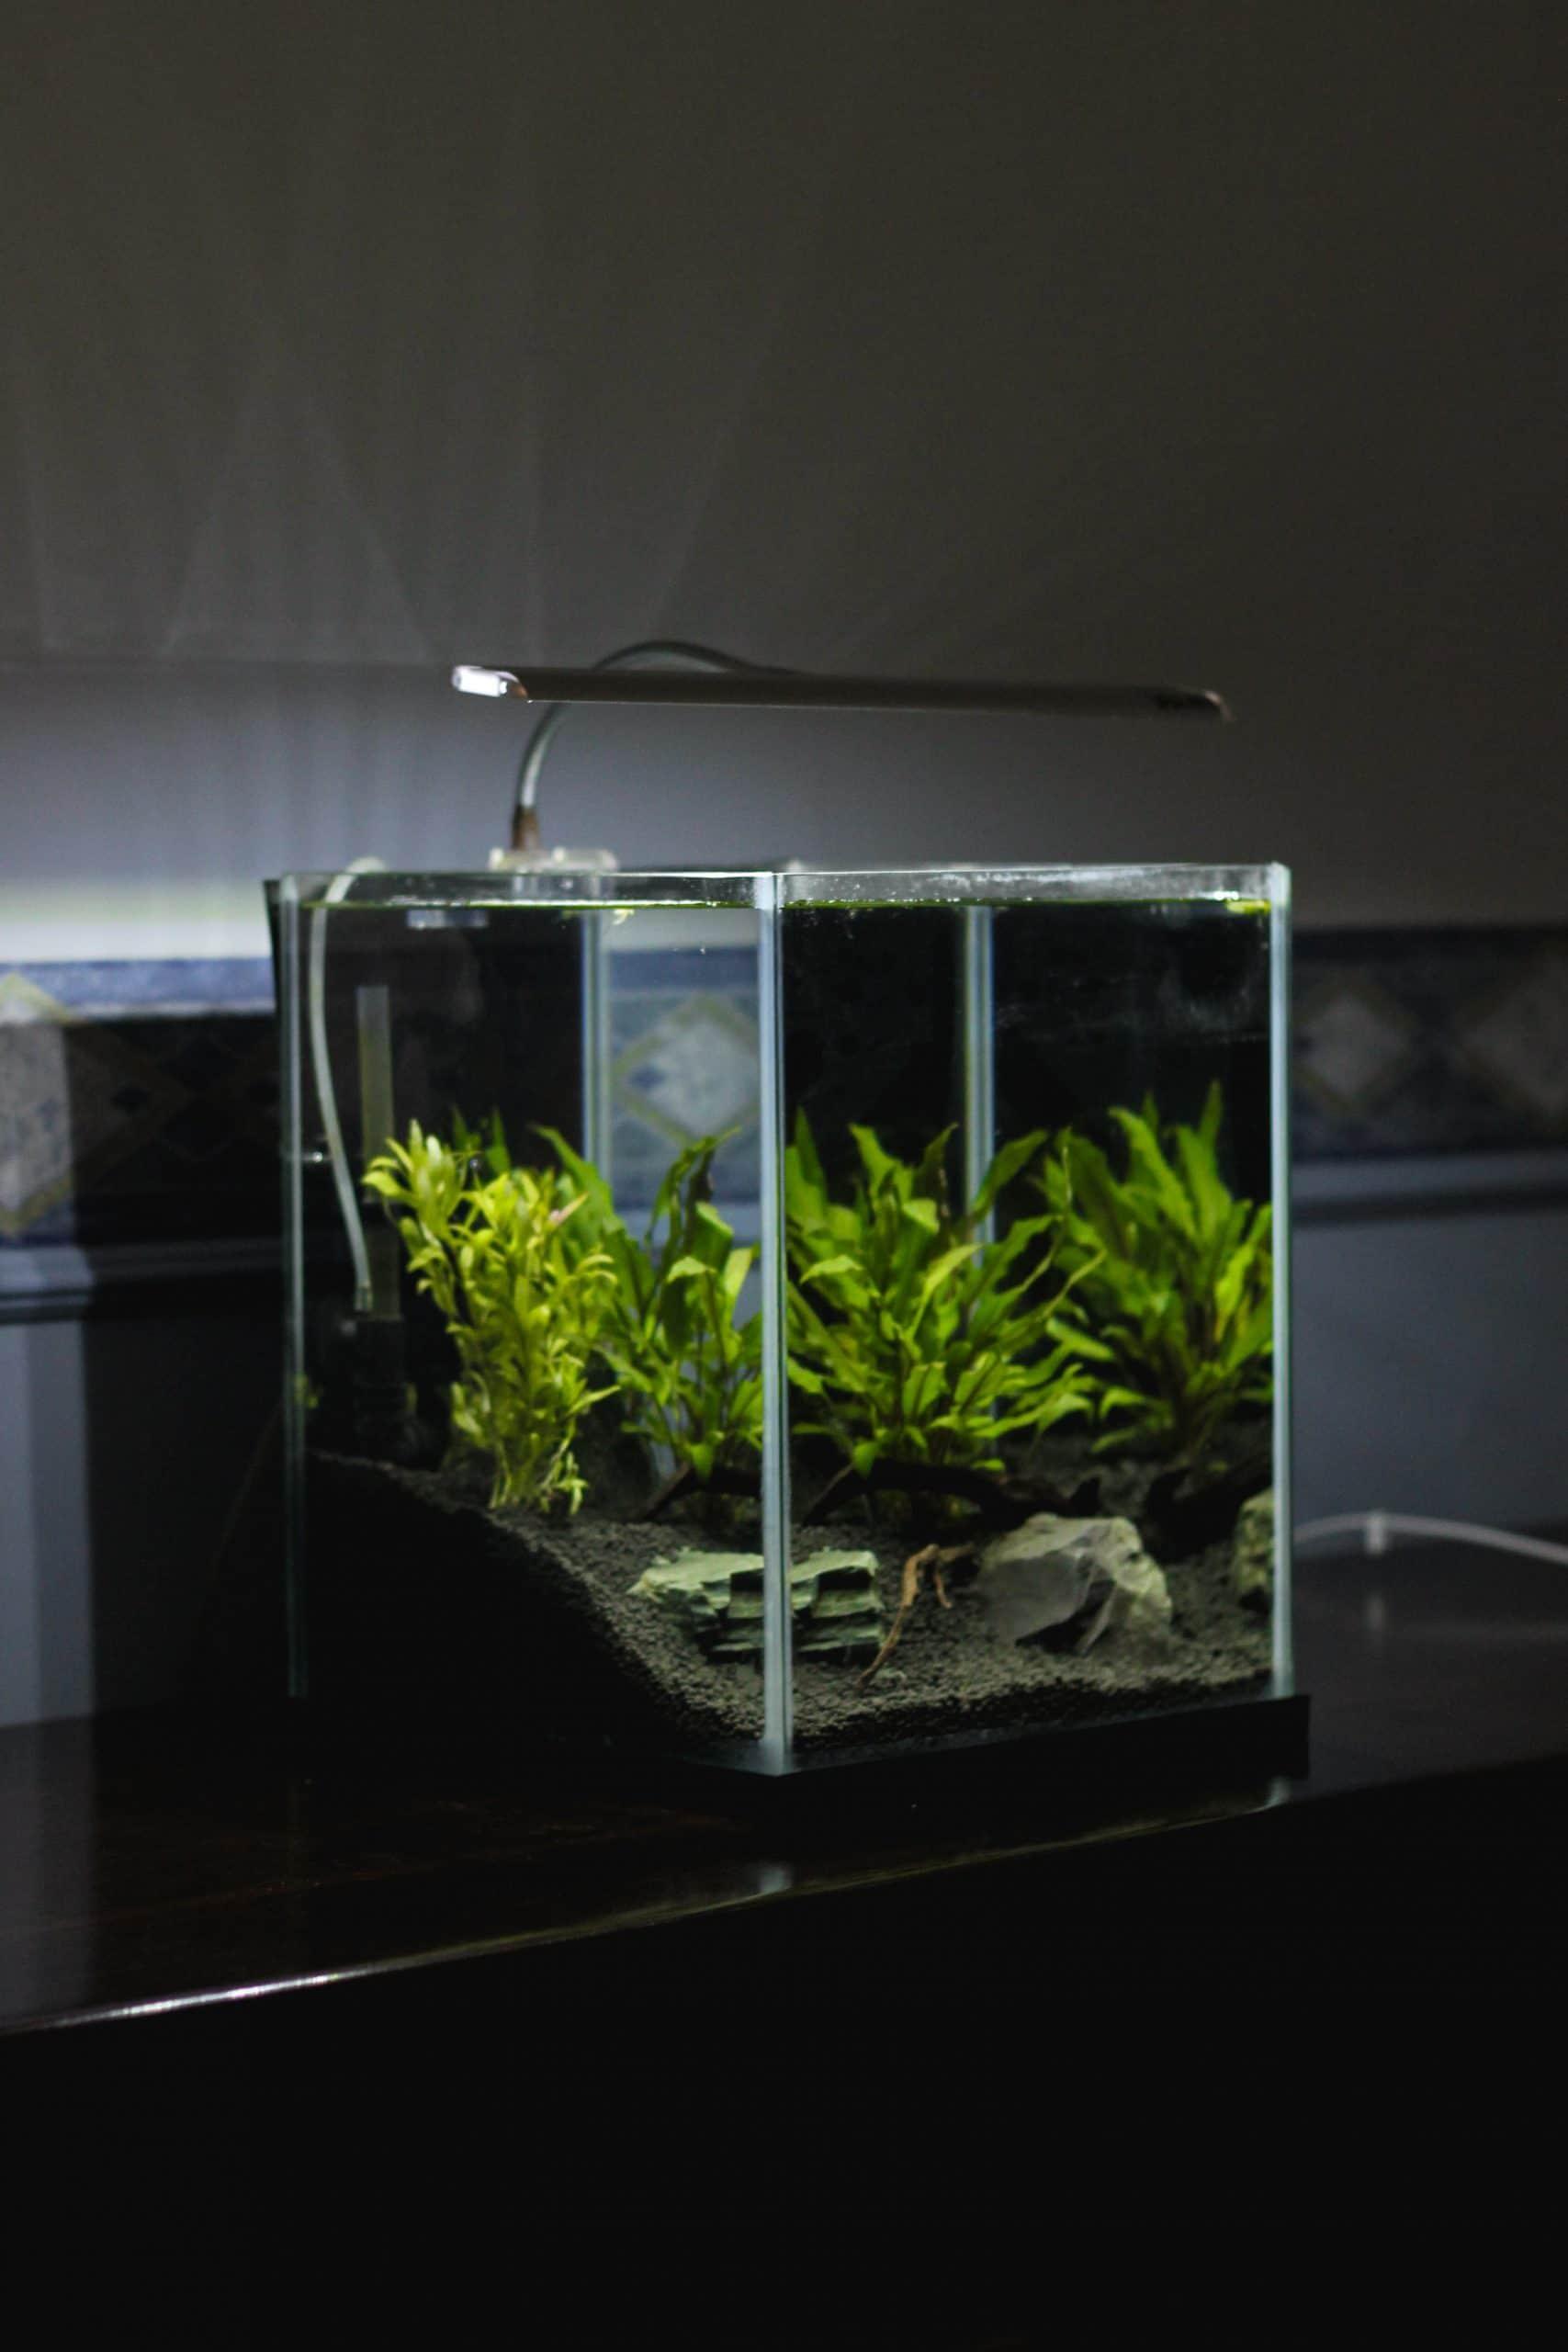 Self-decorated aquariums and fish tanks